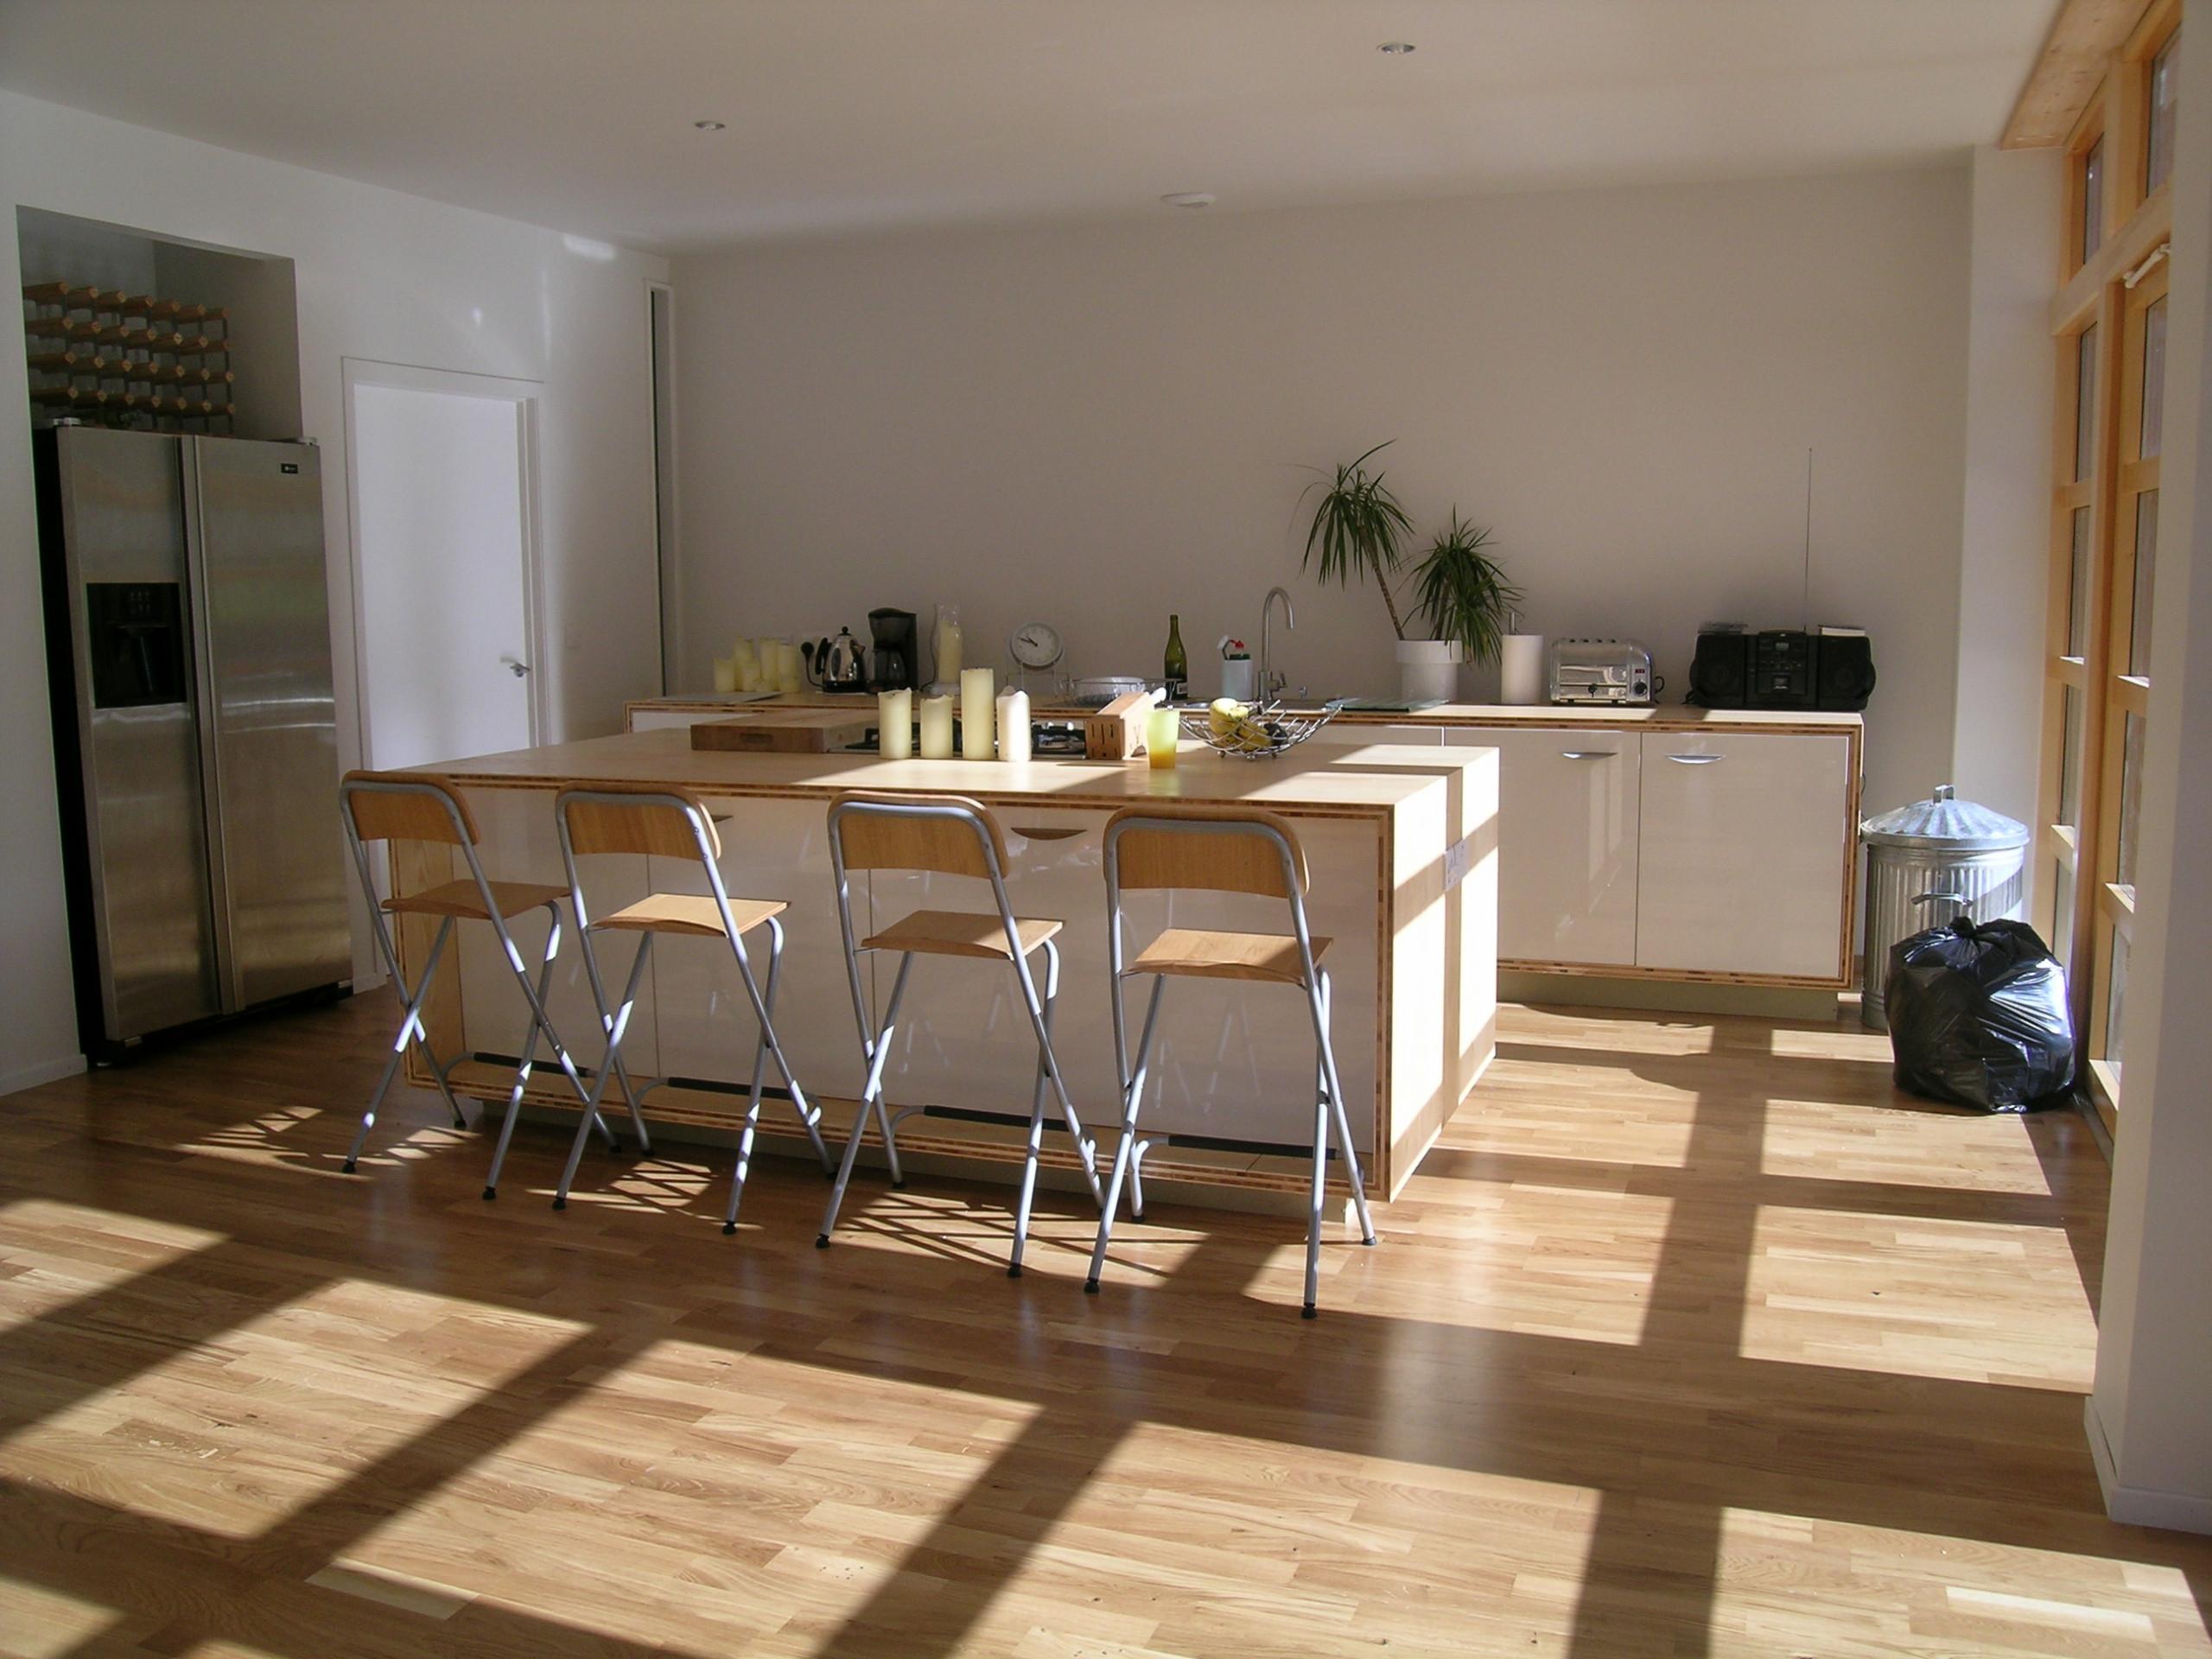 Light filled kitchen area